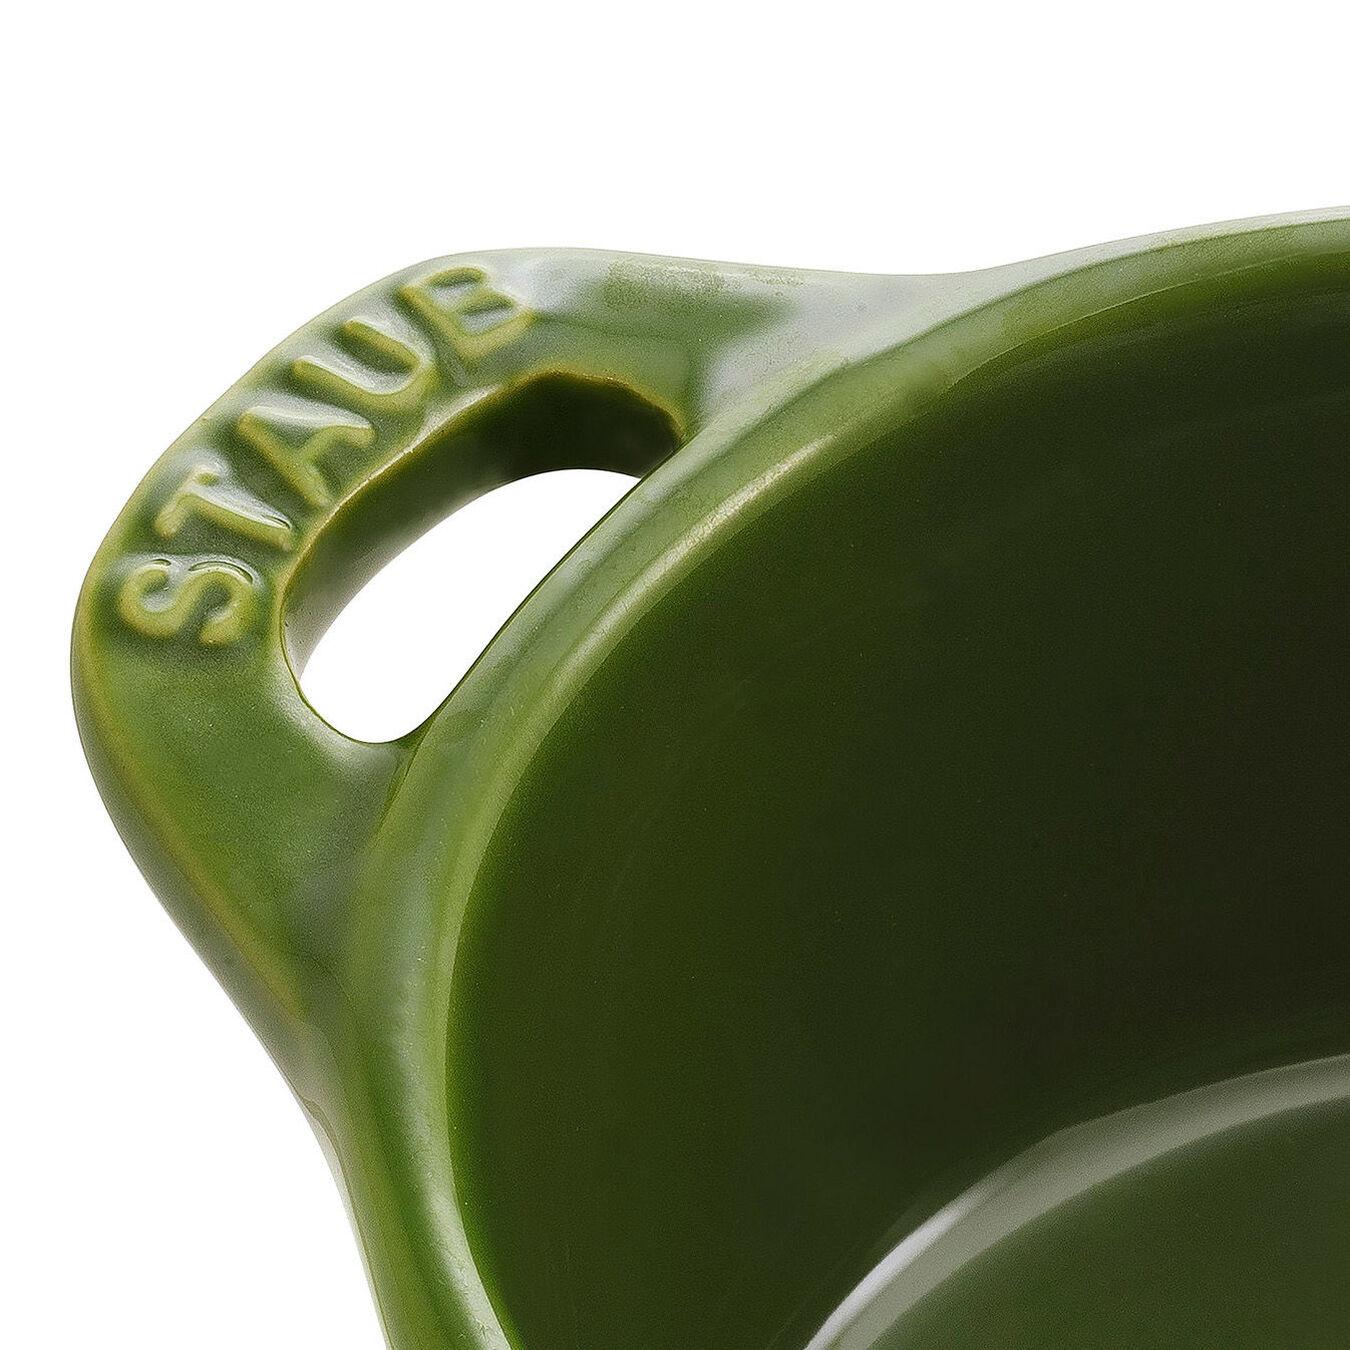 Mini seramik kap, 10 cm | Fesleğen | Yuvarlak | Seramik,,large 4